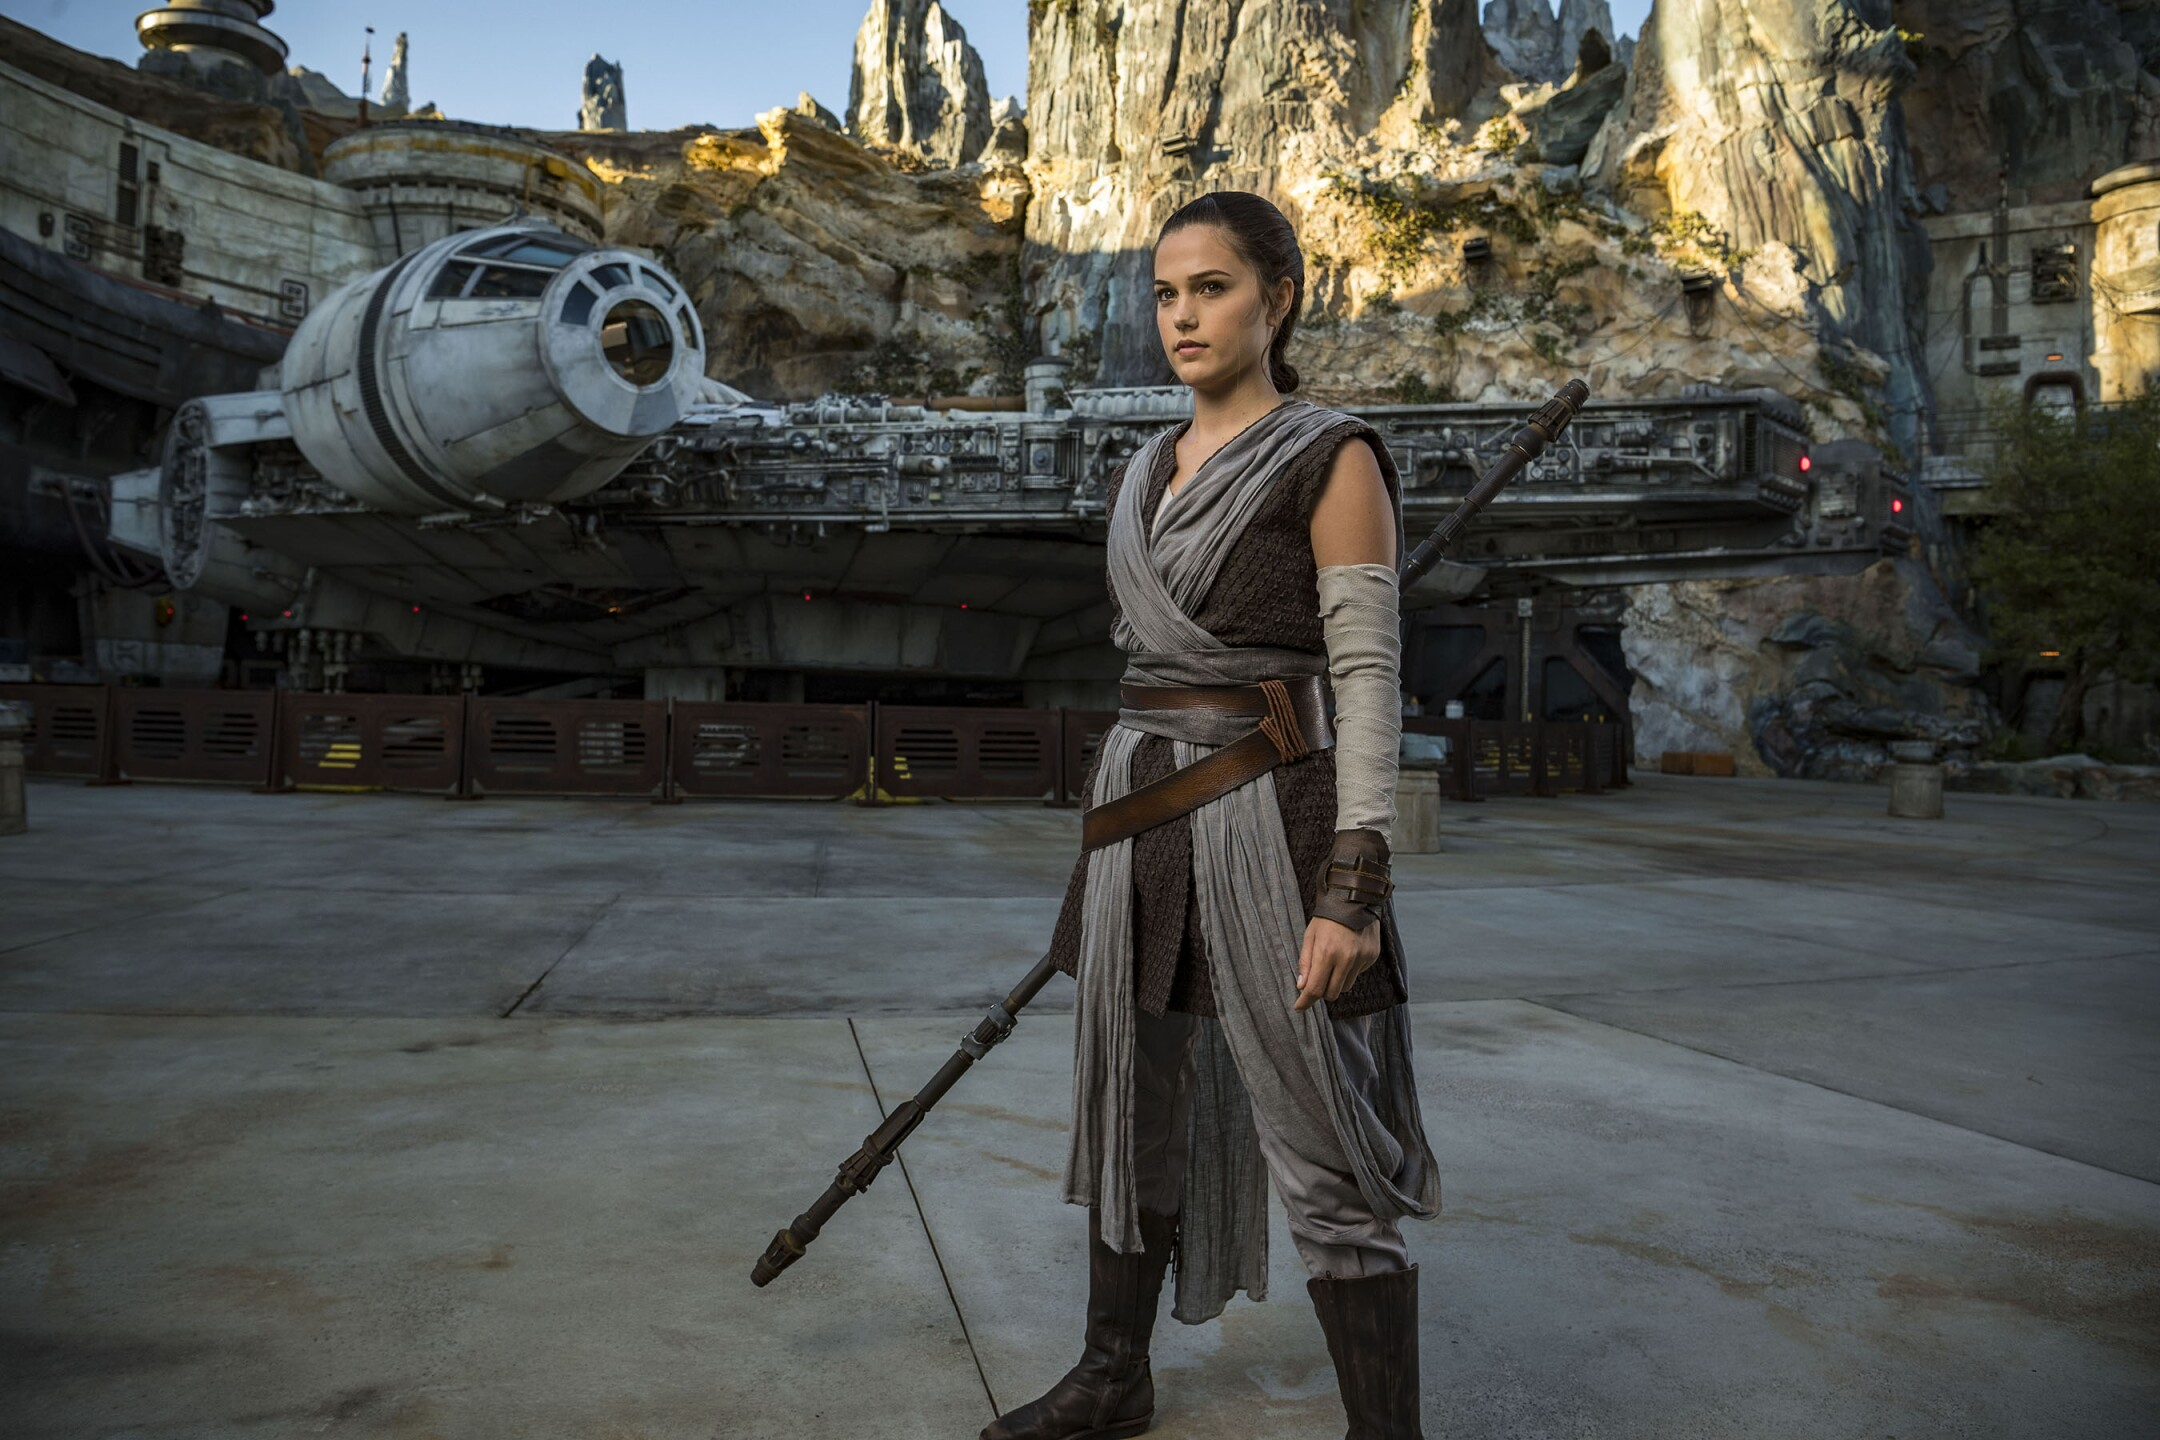 Rey in Star Wars: Galaxy's Edge